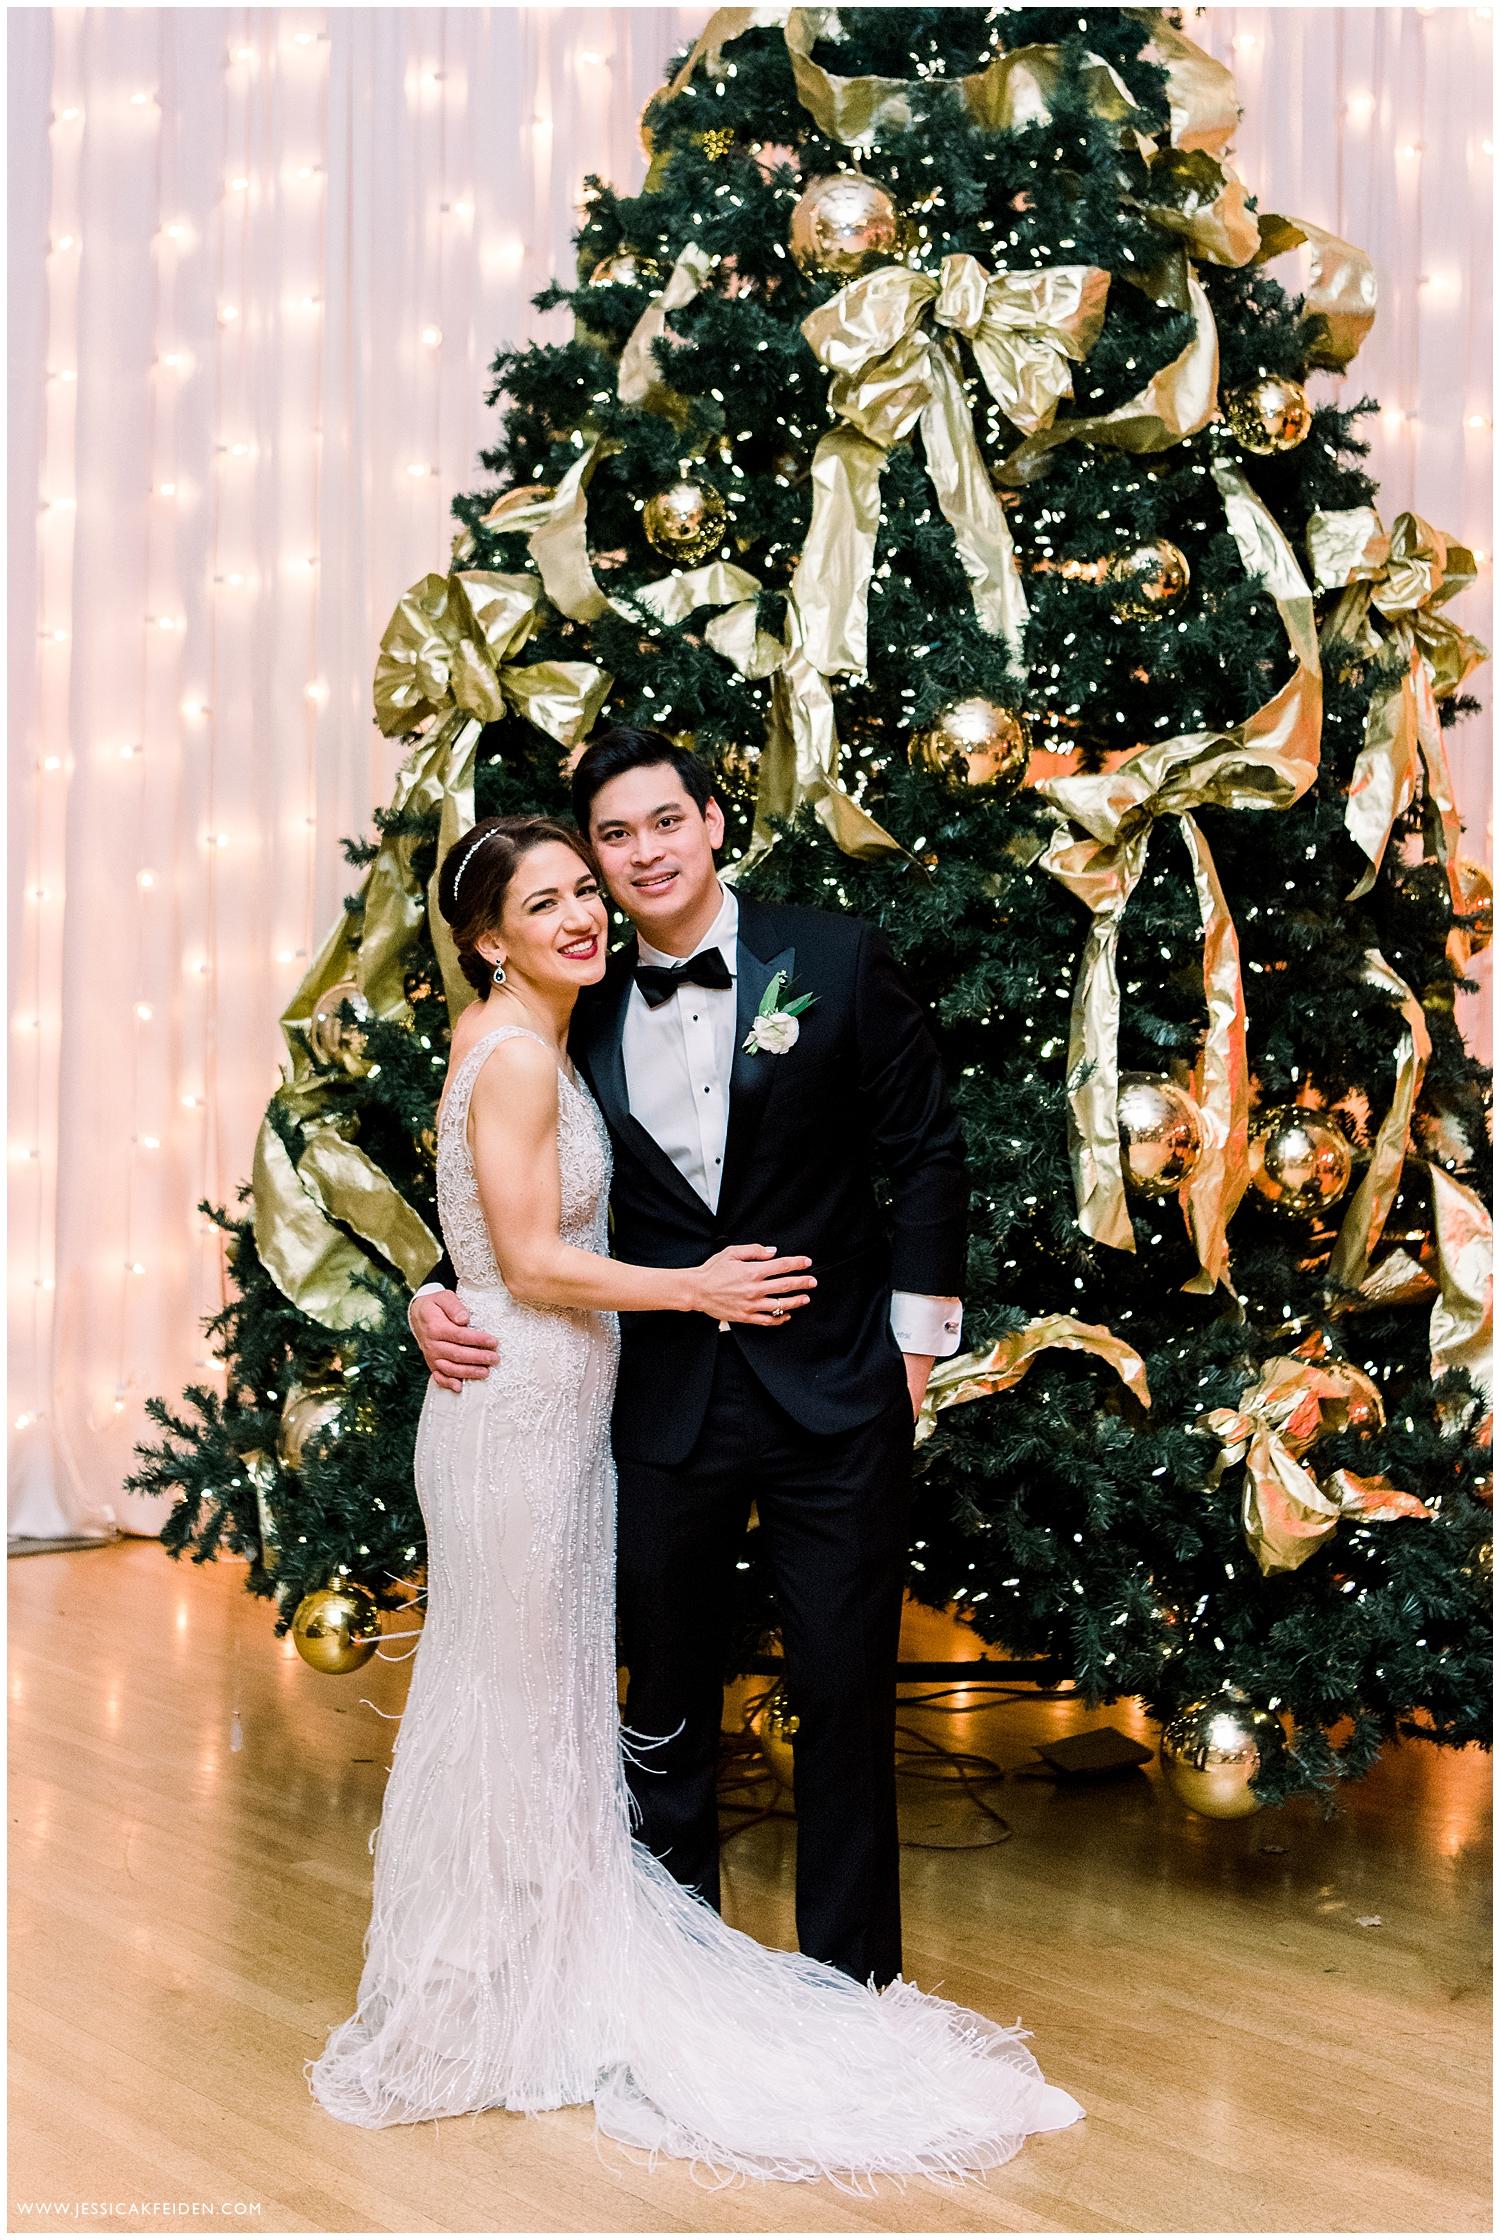 Jessica K Feiden Photography_Emma Willard Franklin Plaza Troy New York Wedding Photographer_0063.jpg